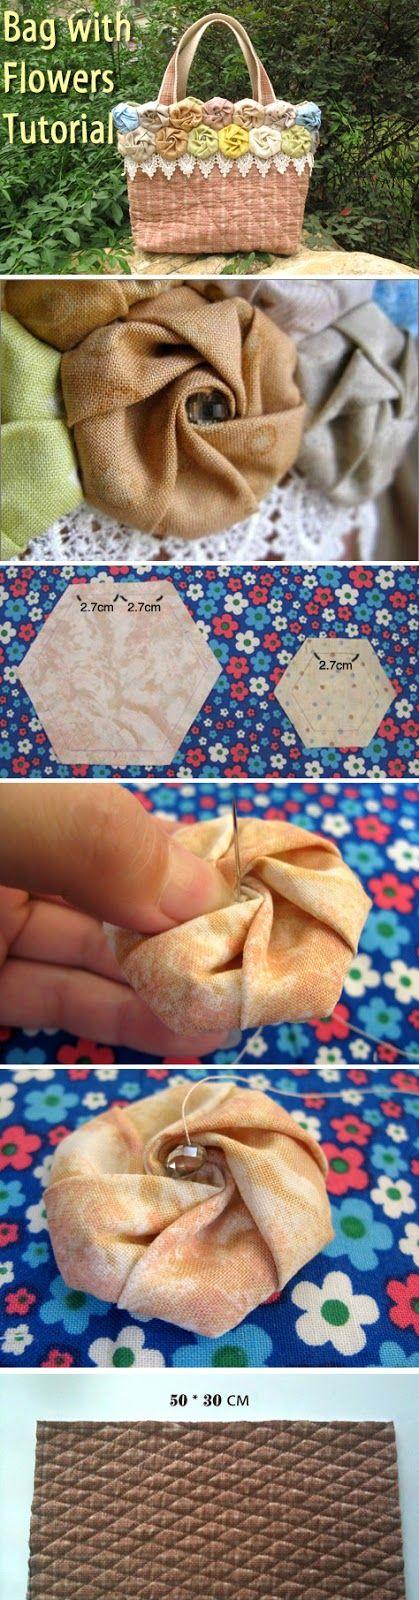 Summer Bag with Flowers. DIY tutorial http://www.handmadiya.com/2012/06/blog-post_09.html